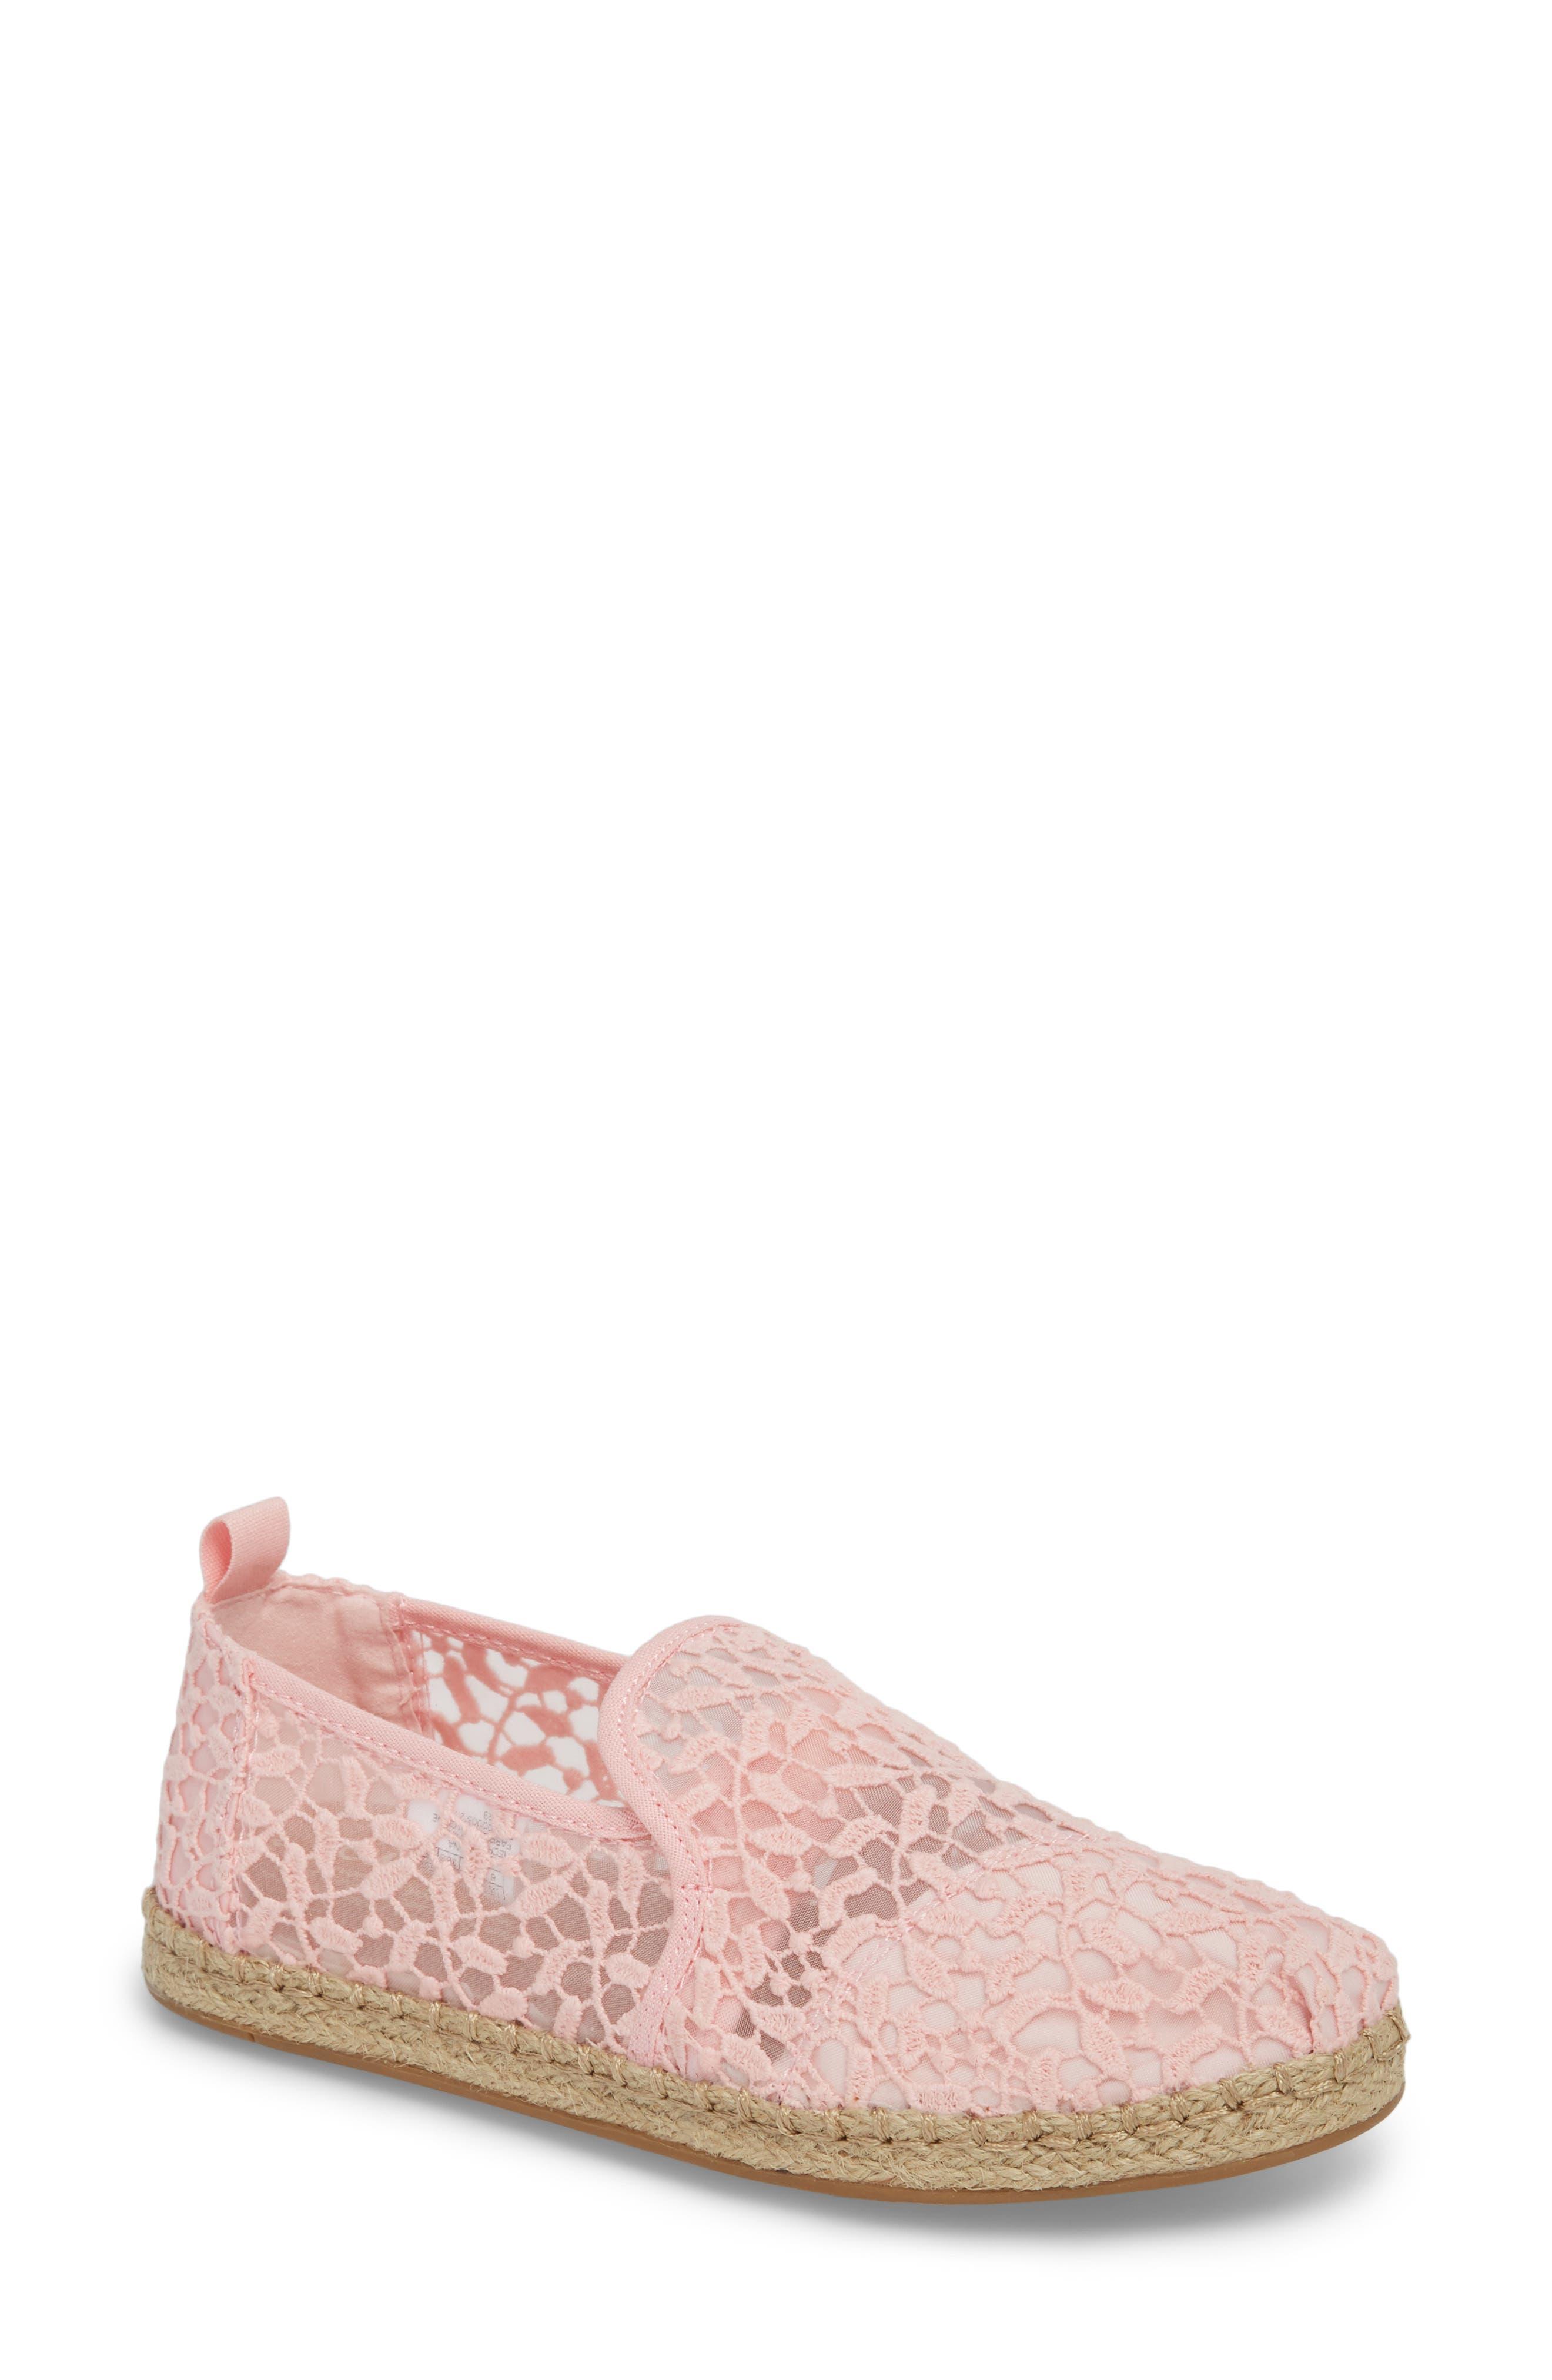 Deconstructed Alpargata Espadrille Slip-On,                         Main,                         color, Blossom Lace Leaves